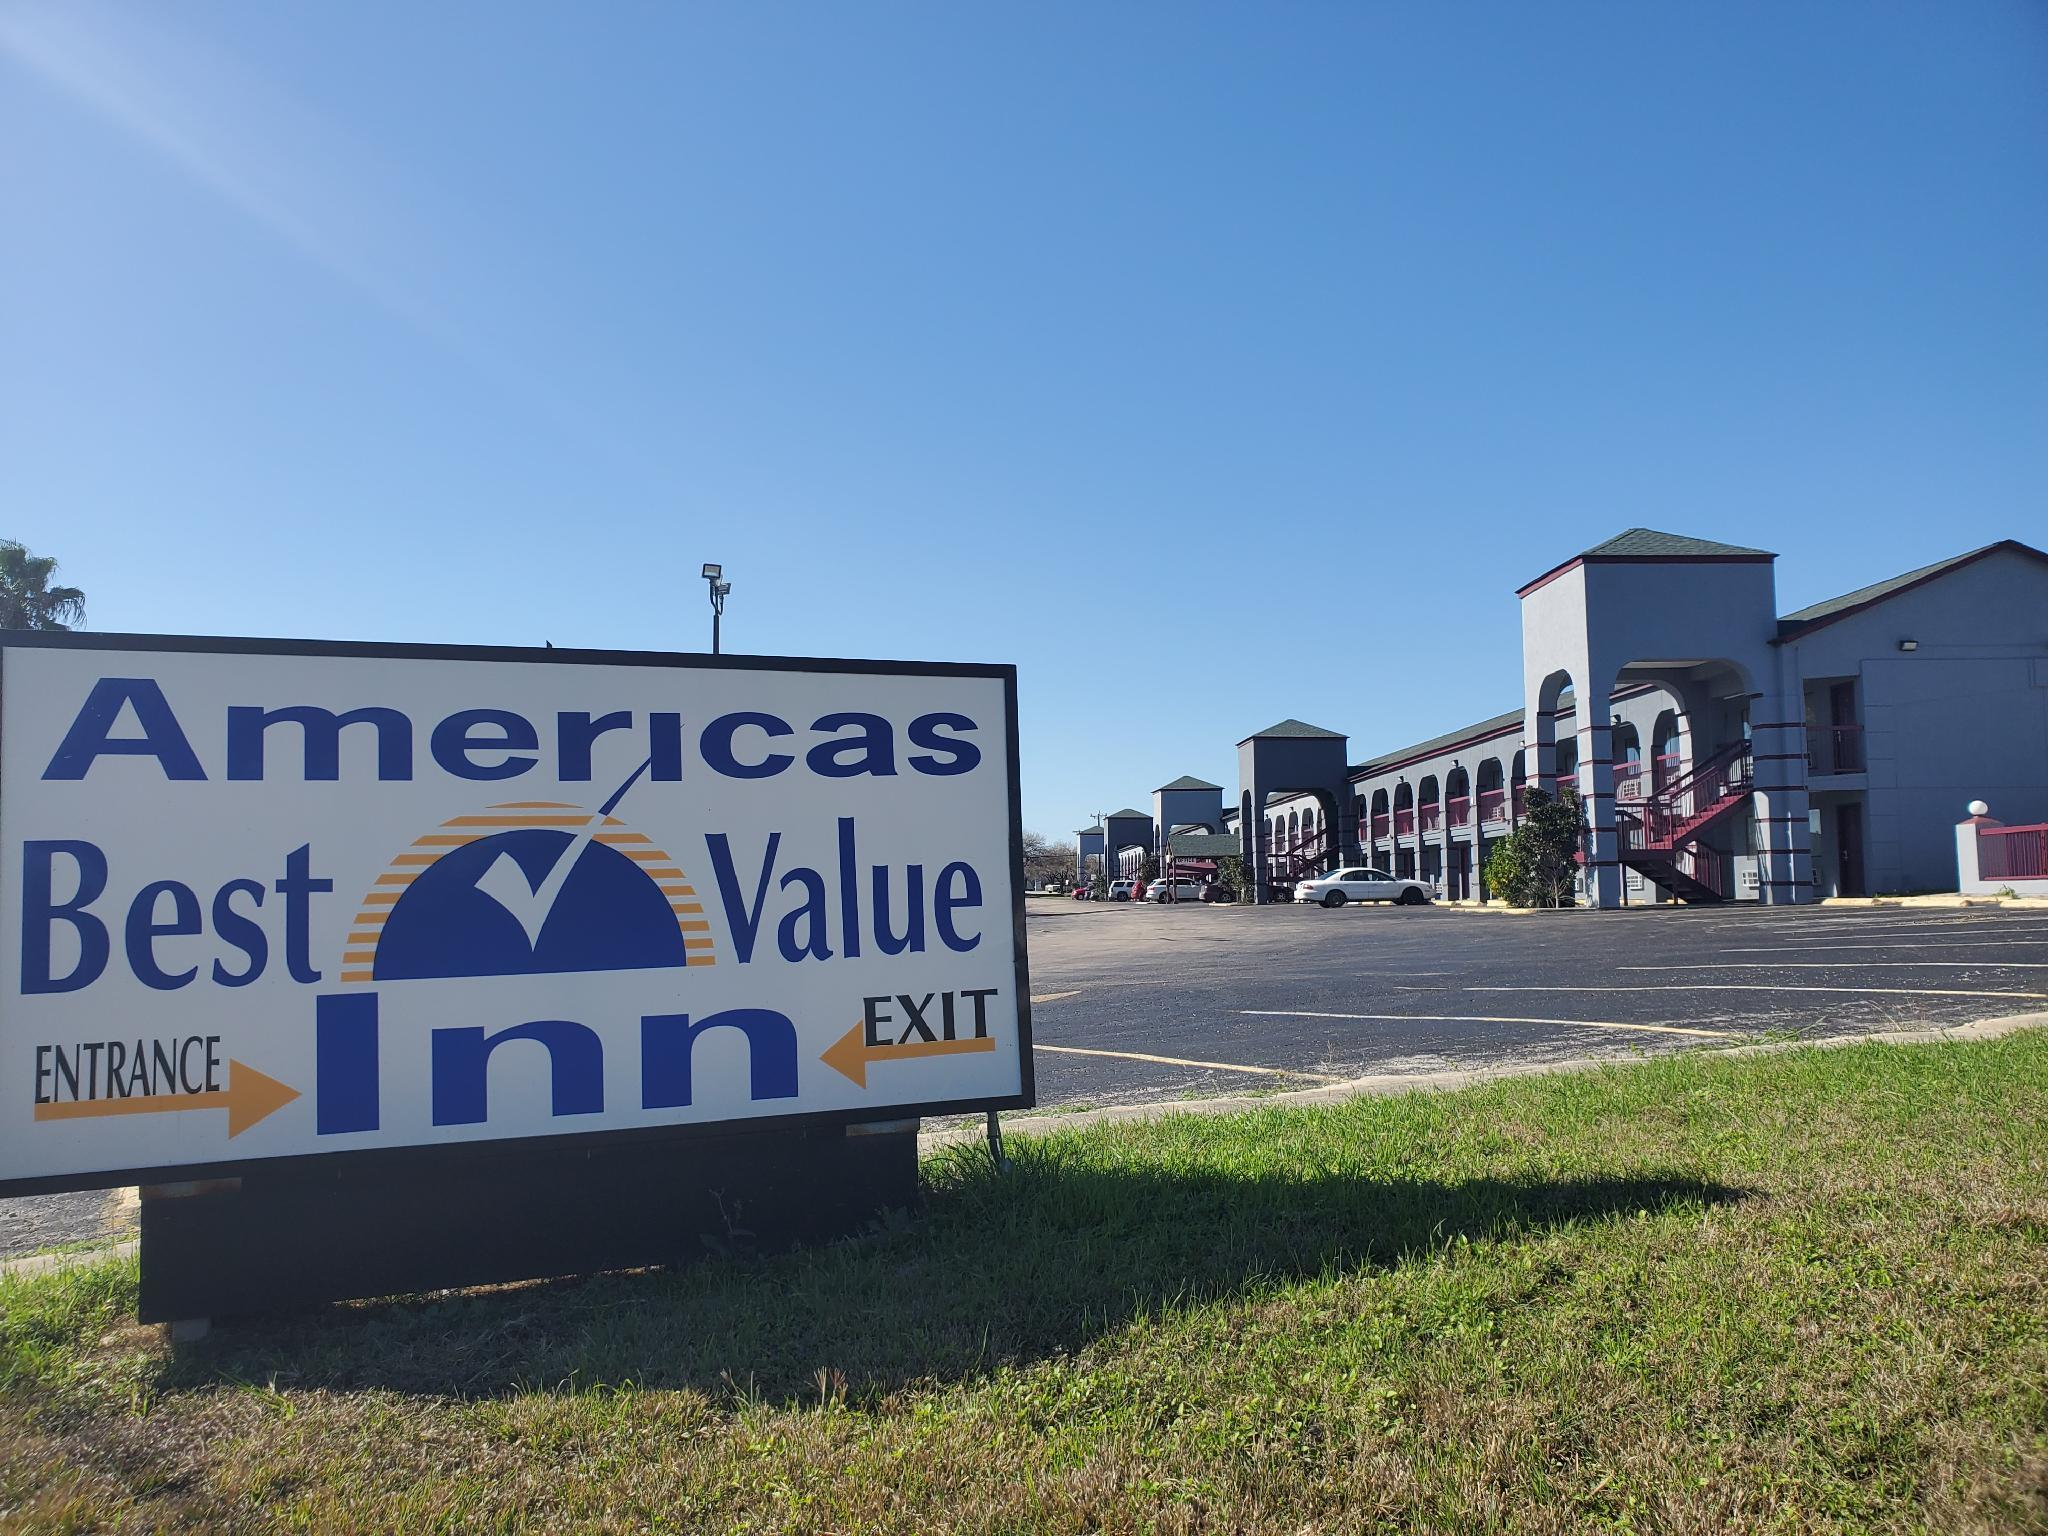 Americas Best Value Inn ATandT Center